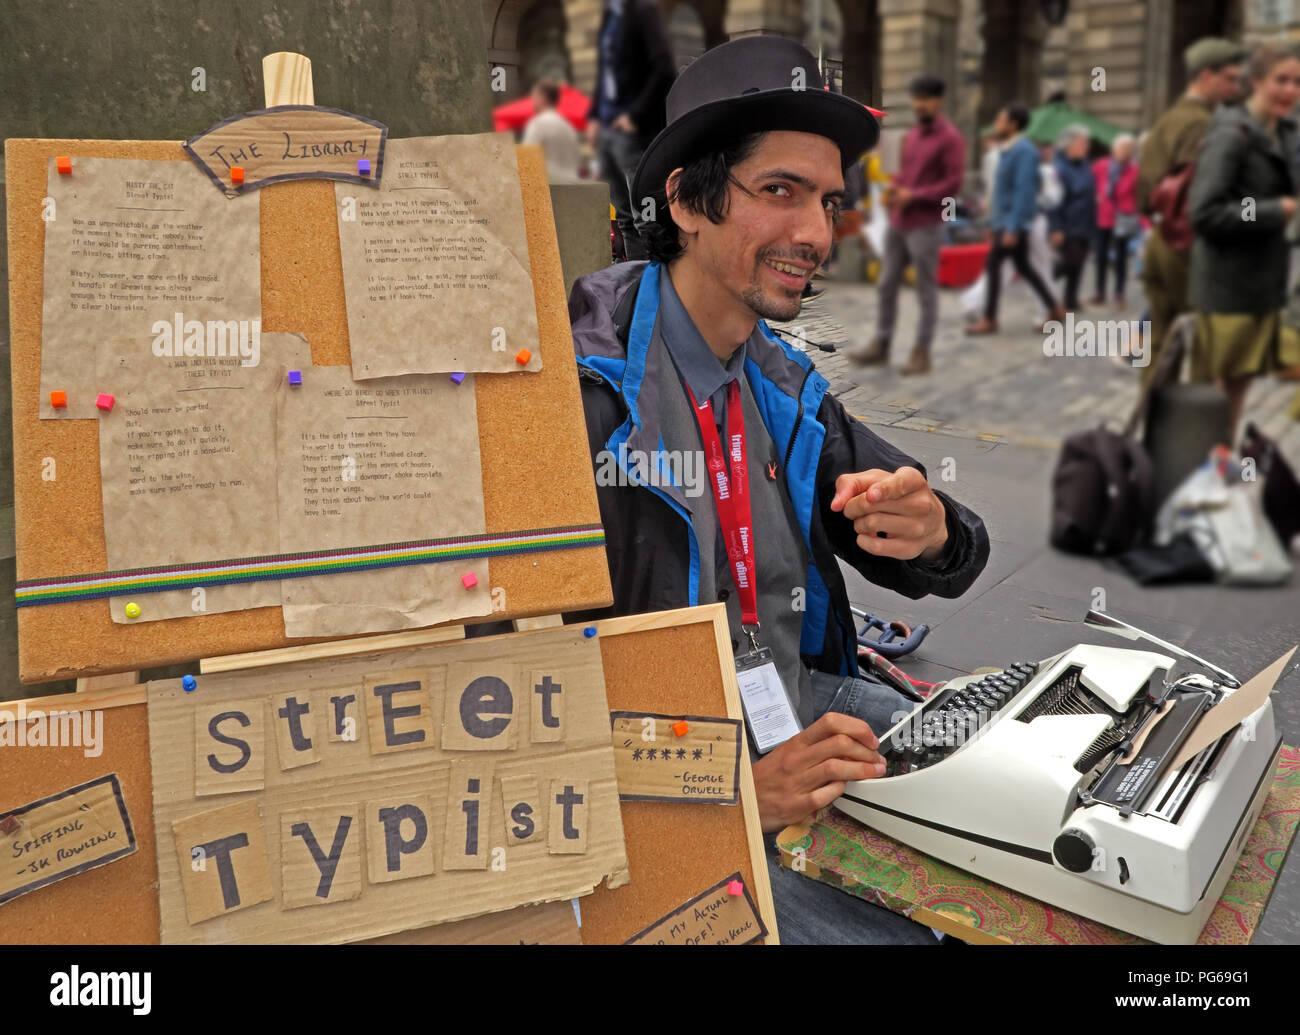 @Hotpixuk,fringe,city centre,Scotland,Edinburgh Festival Fringe,August 2018,2018,Lothian,Lothians,High St,High Street,poems,story,stories,old typewriter,keystrokes,keys,keyboard,GoTonySmith,HotpixUK,sound of the typewriter,typewriter sound,typists,typist,typist on the street,festival street typist,antique Jumbo Easytyper,Jumbo Easytyper,Easytyper,Royal Mile,outside St Giles Cathedral,order a story,busker,busking,street busker,street typist busker